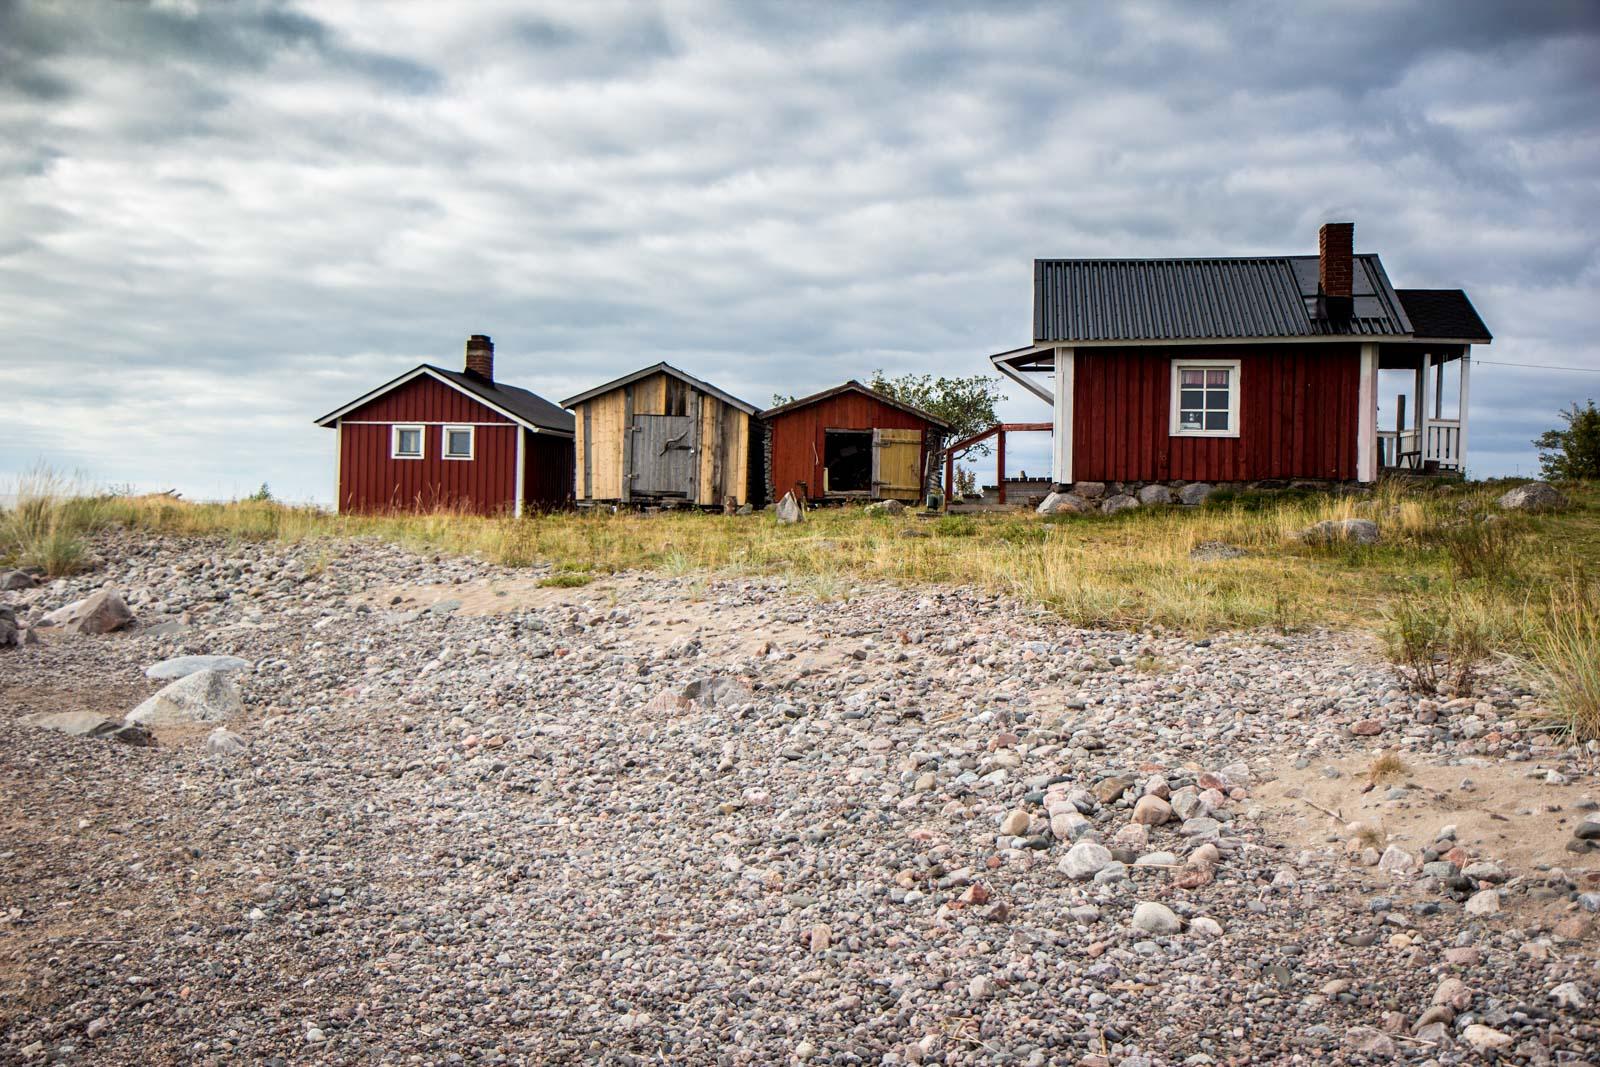 Maakalla Island, Kalajoki, Finland